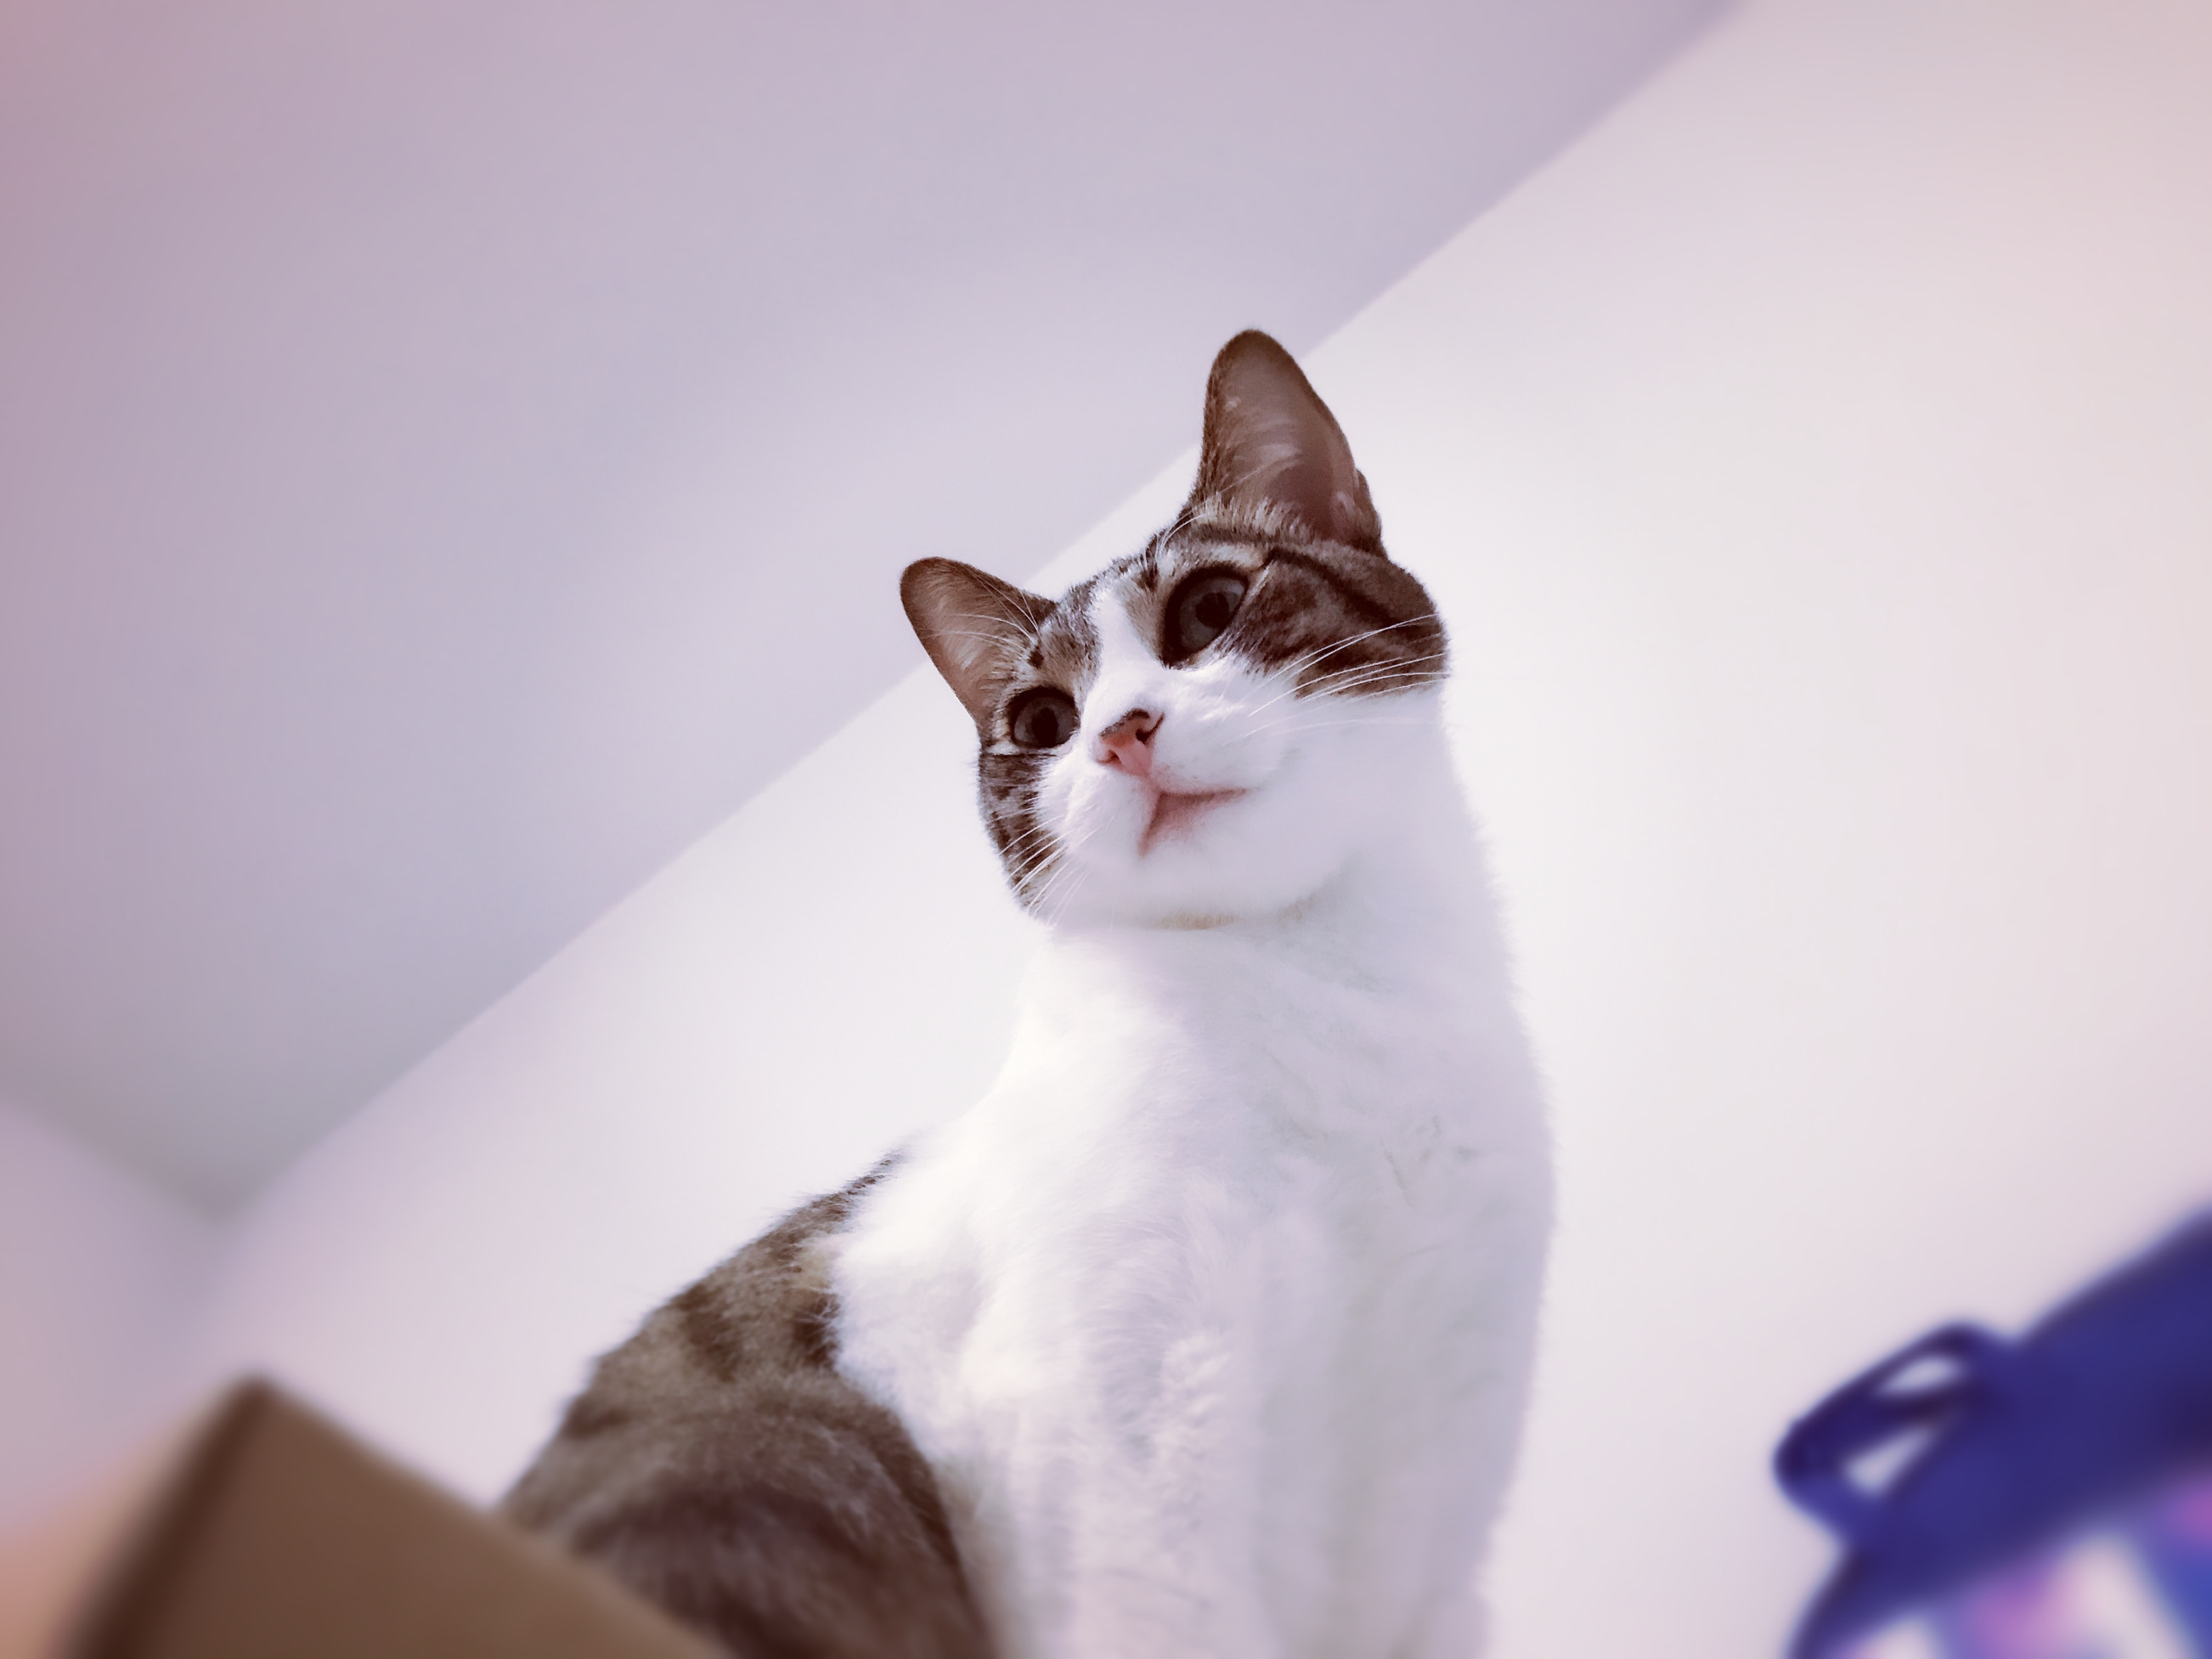 brown tabby cat on brown box